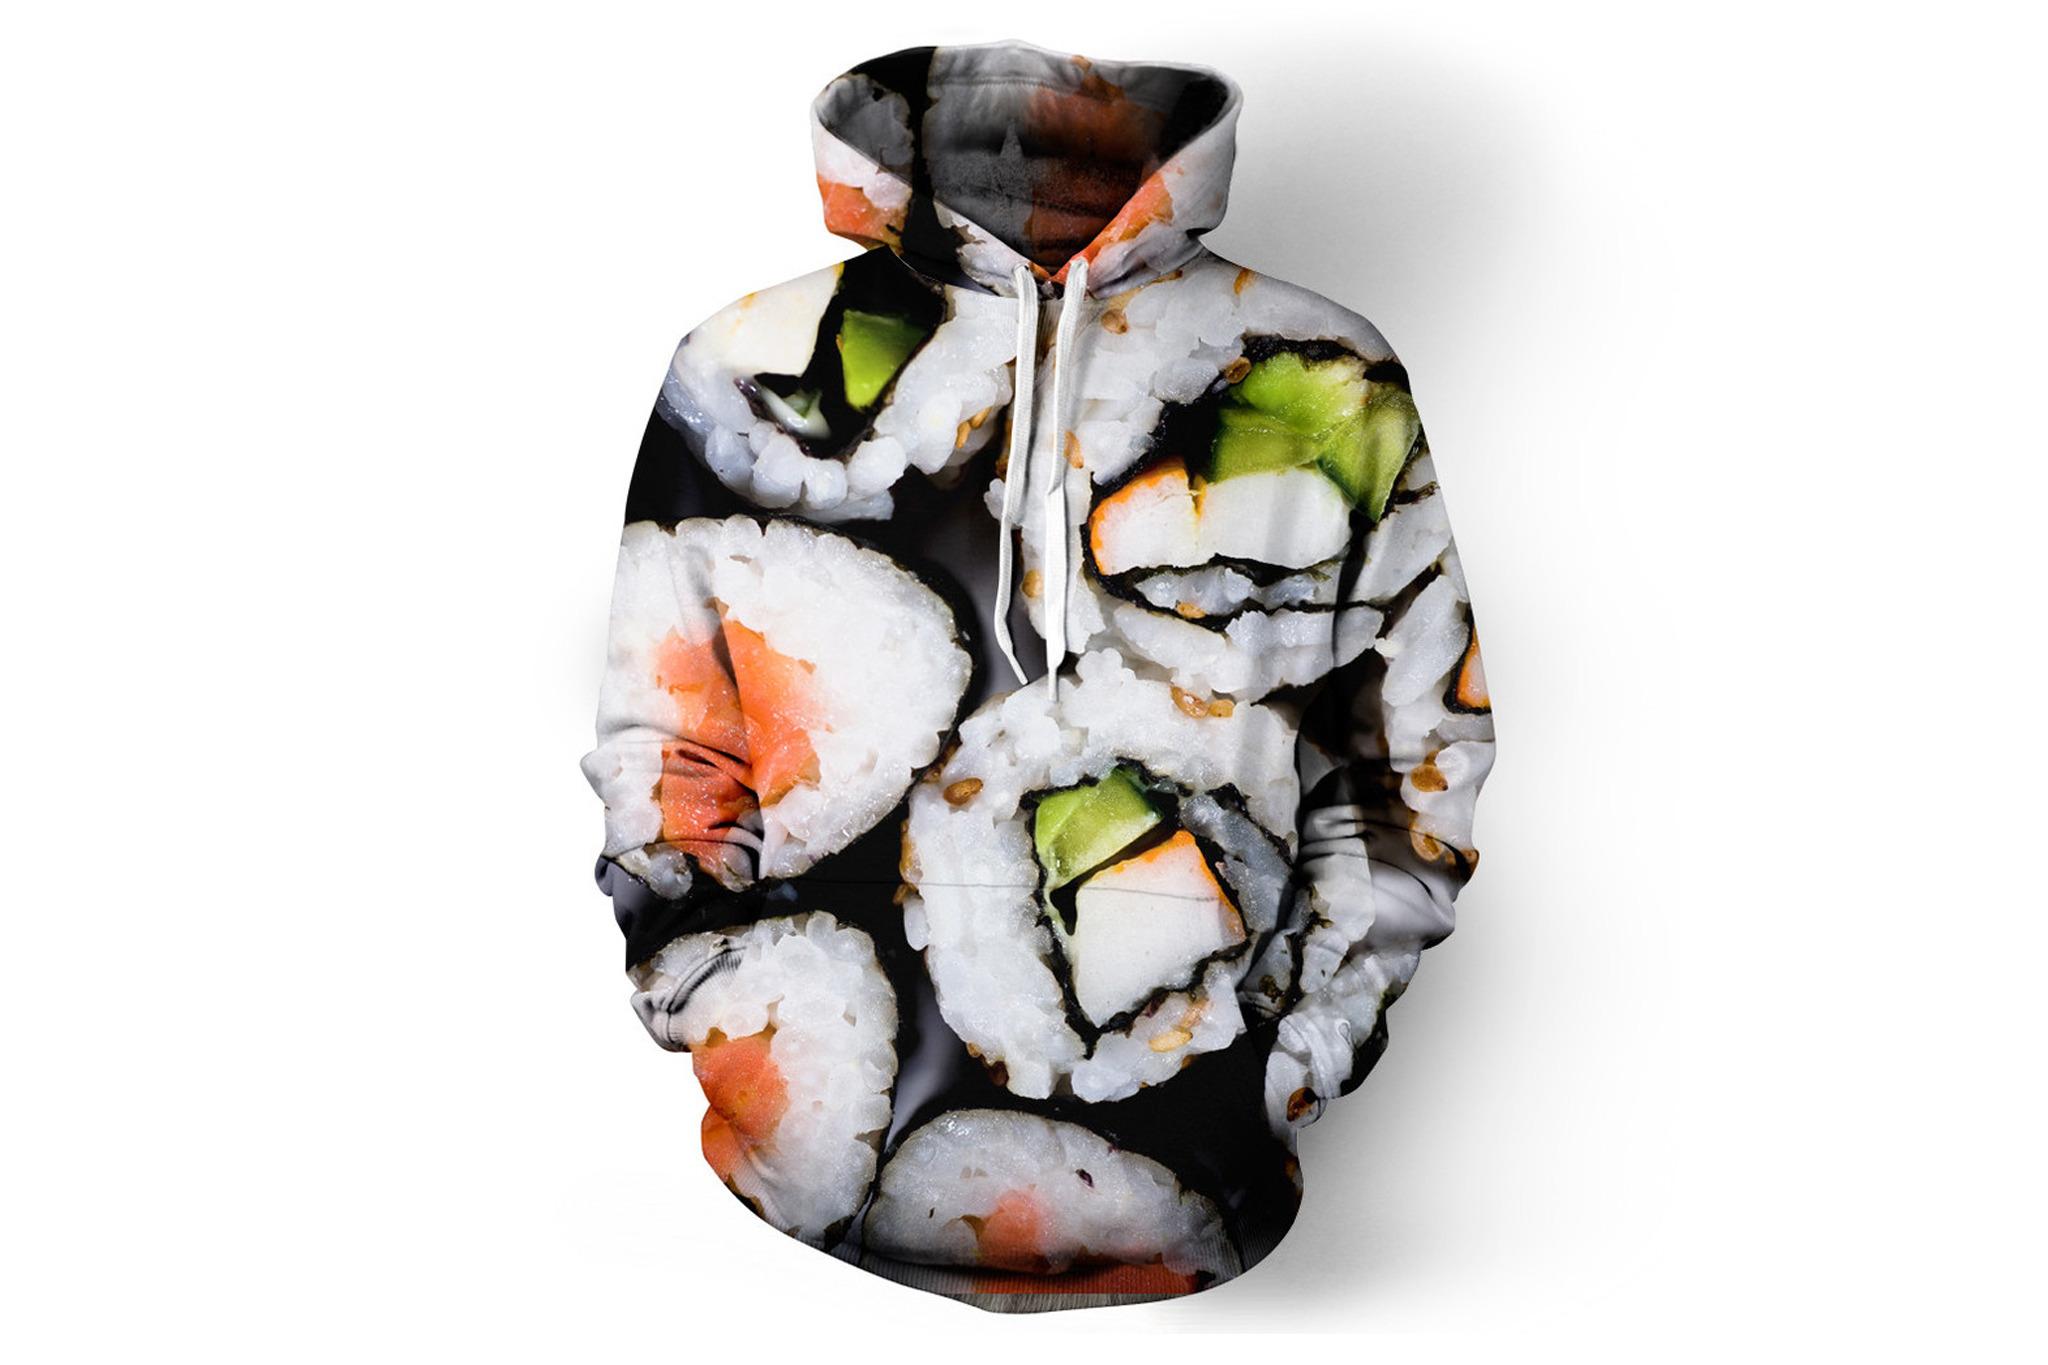 Beloved Sushi hoodie, $68, at belovedshirts.com